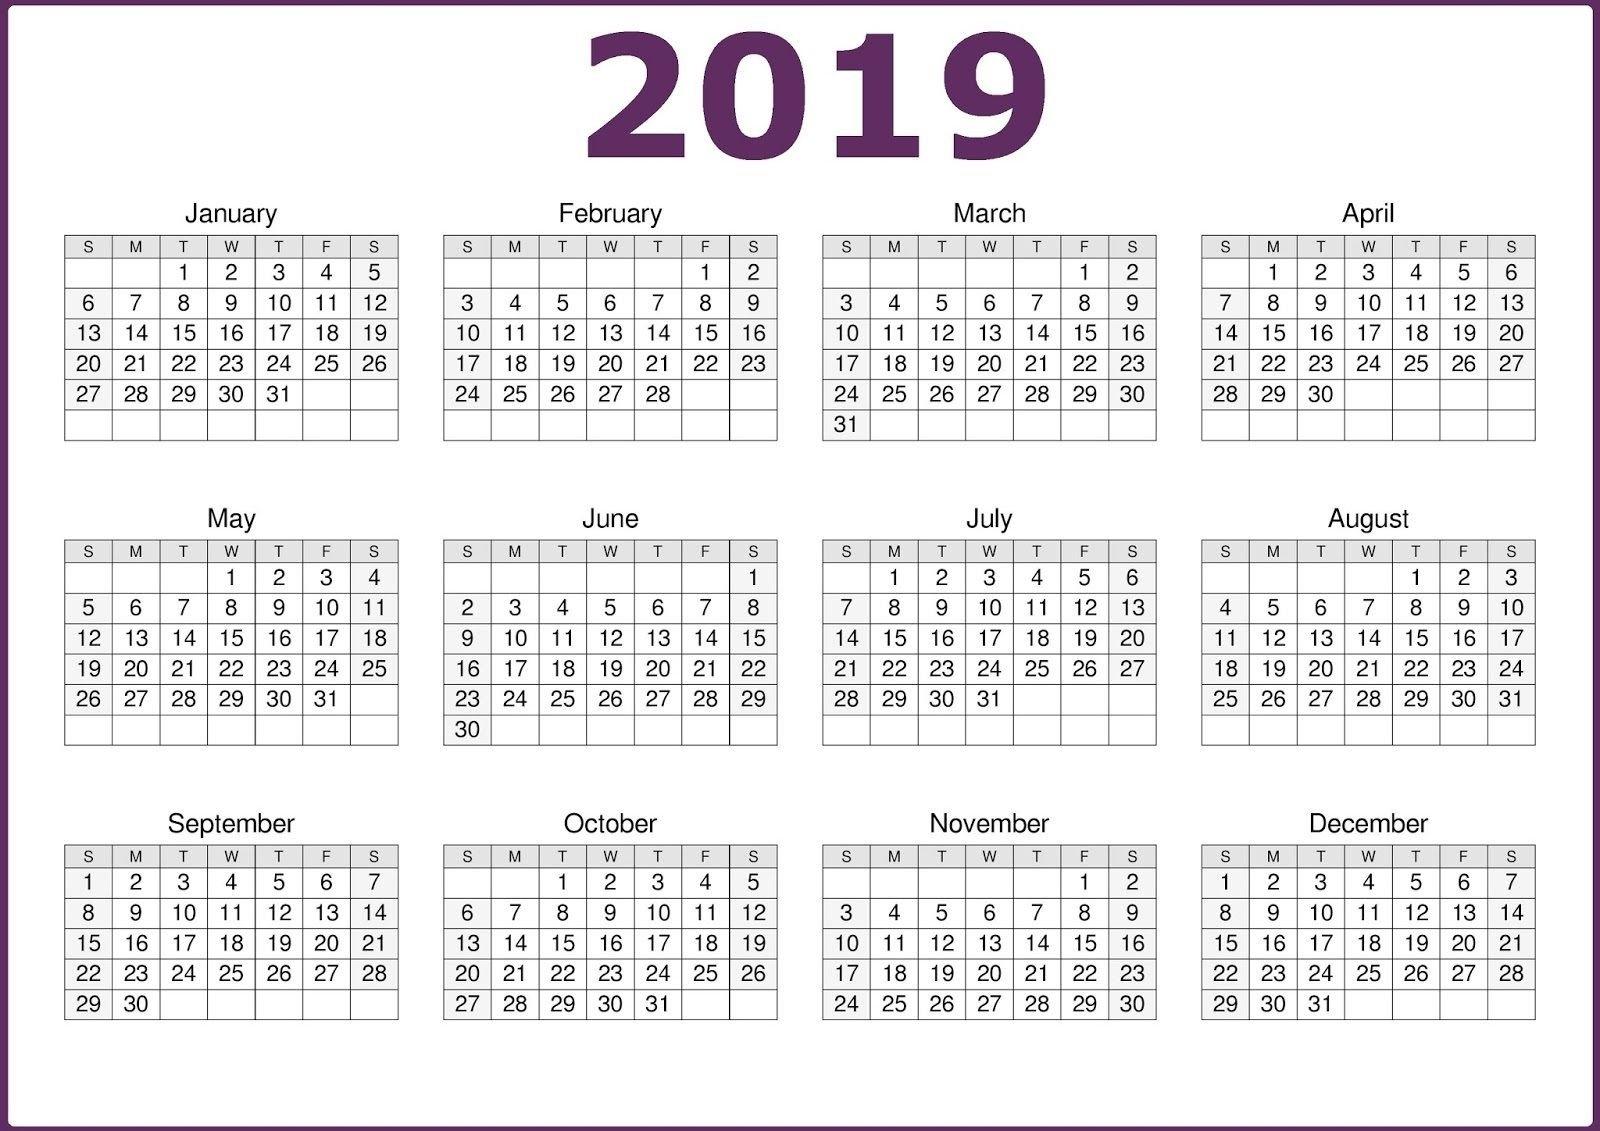 2019 One Page 12 Months Calendar | 2019 Calendars | Pinterest Calendar 2019 One Page